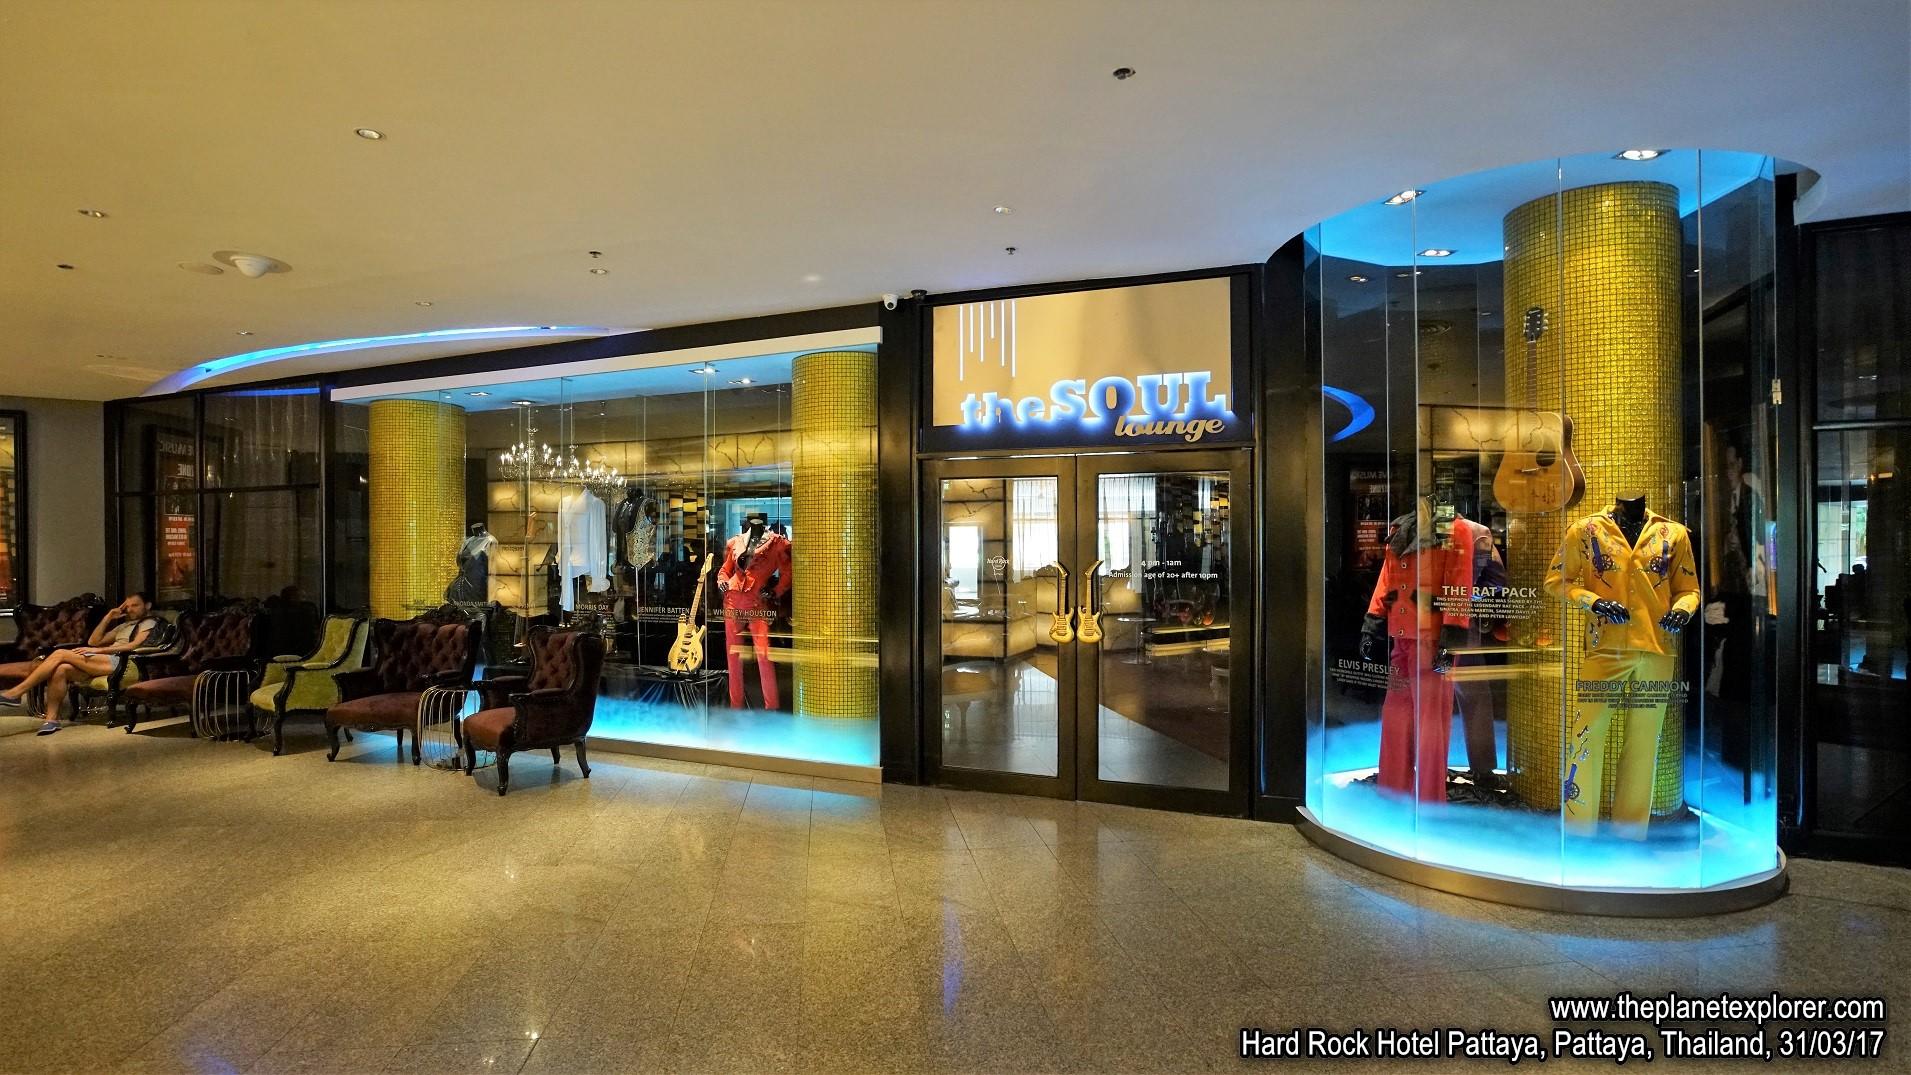 2017-03-31_1325_Thailand_Pattaya_Hard Rock Hotel Pattaya_DSC04162_s7R2_LR_@